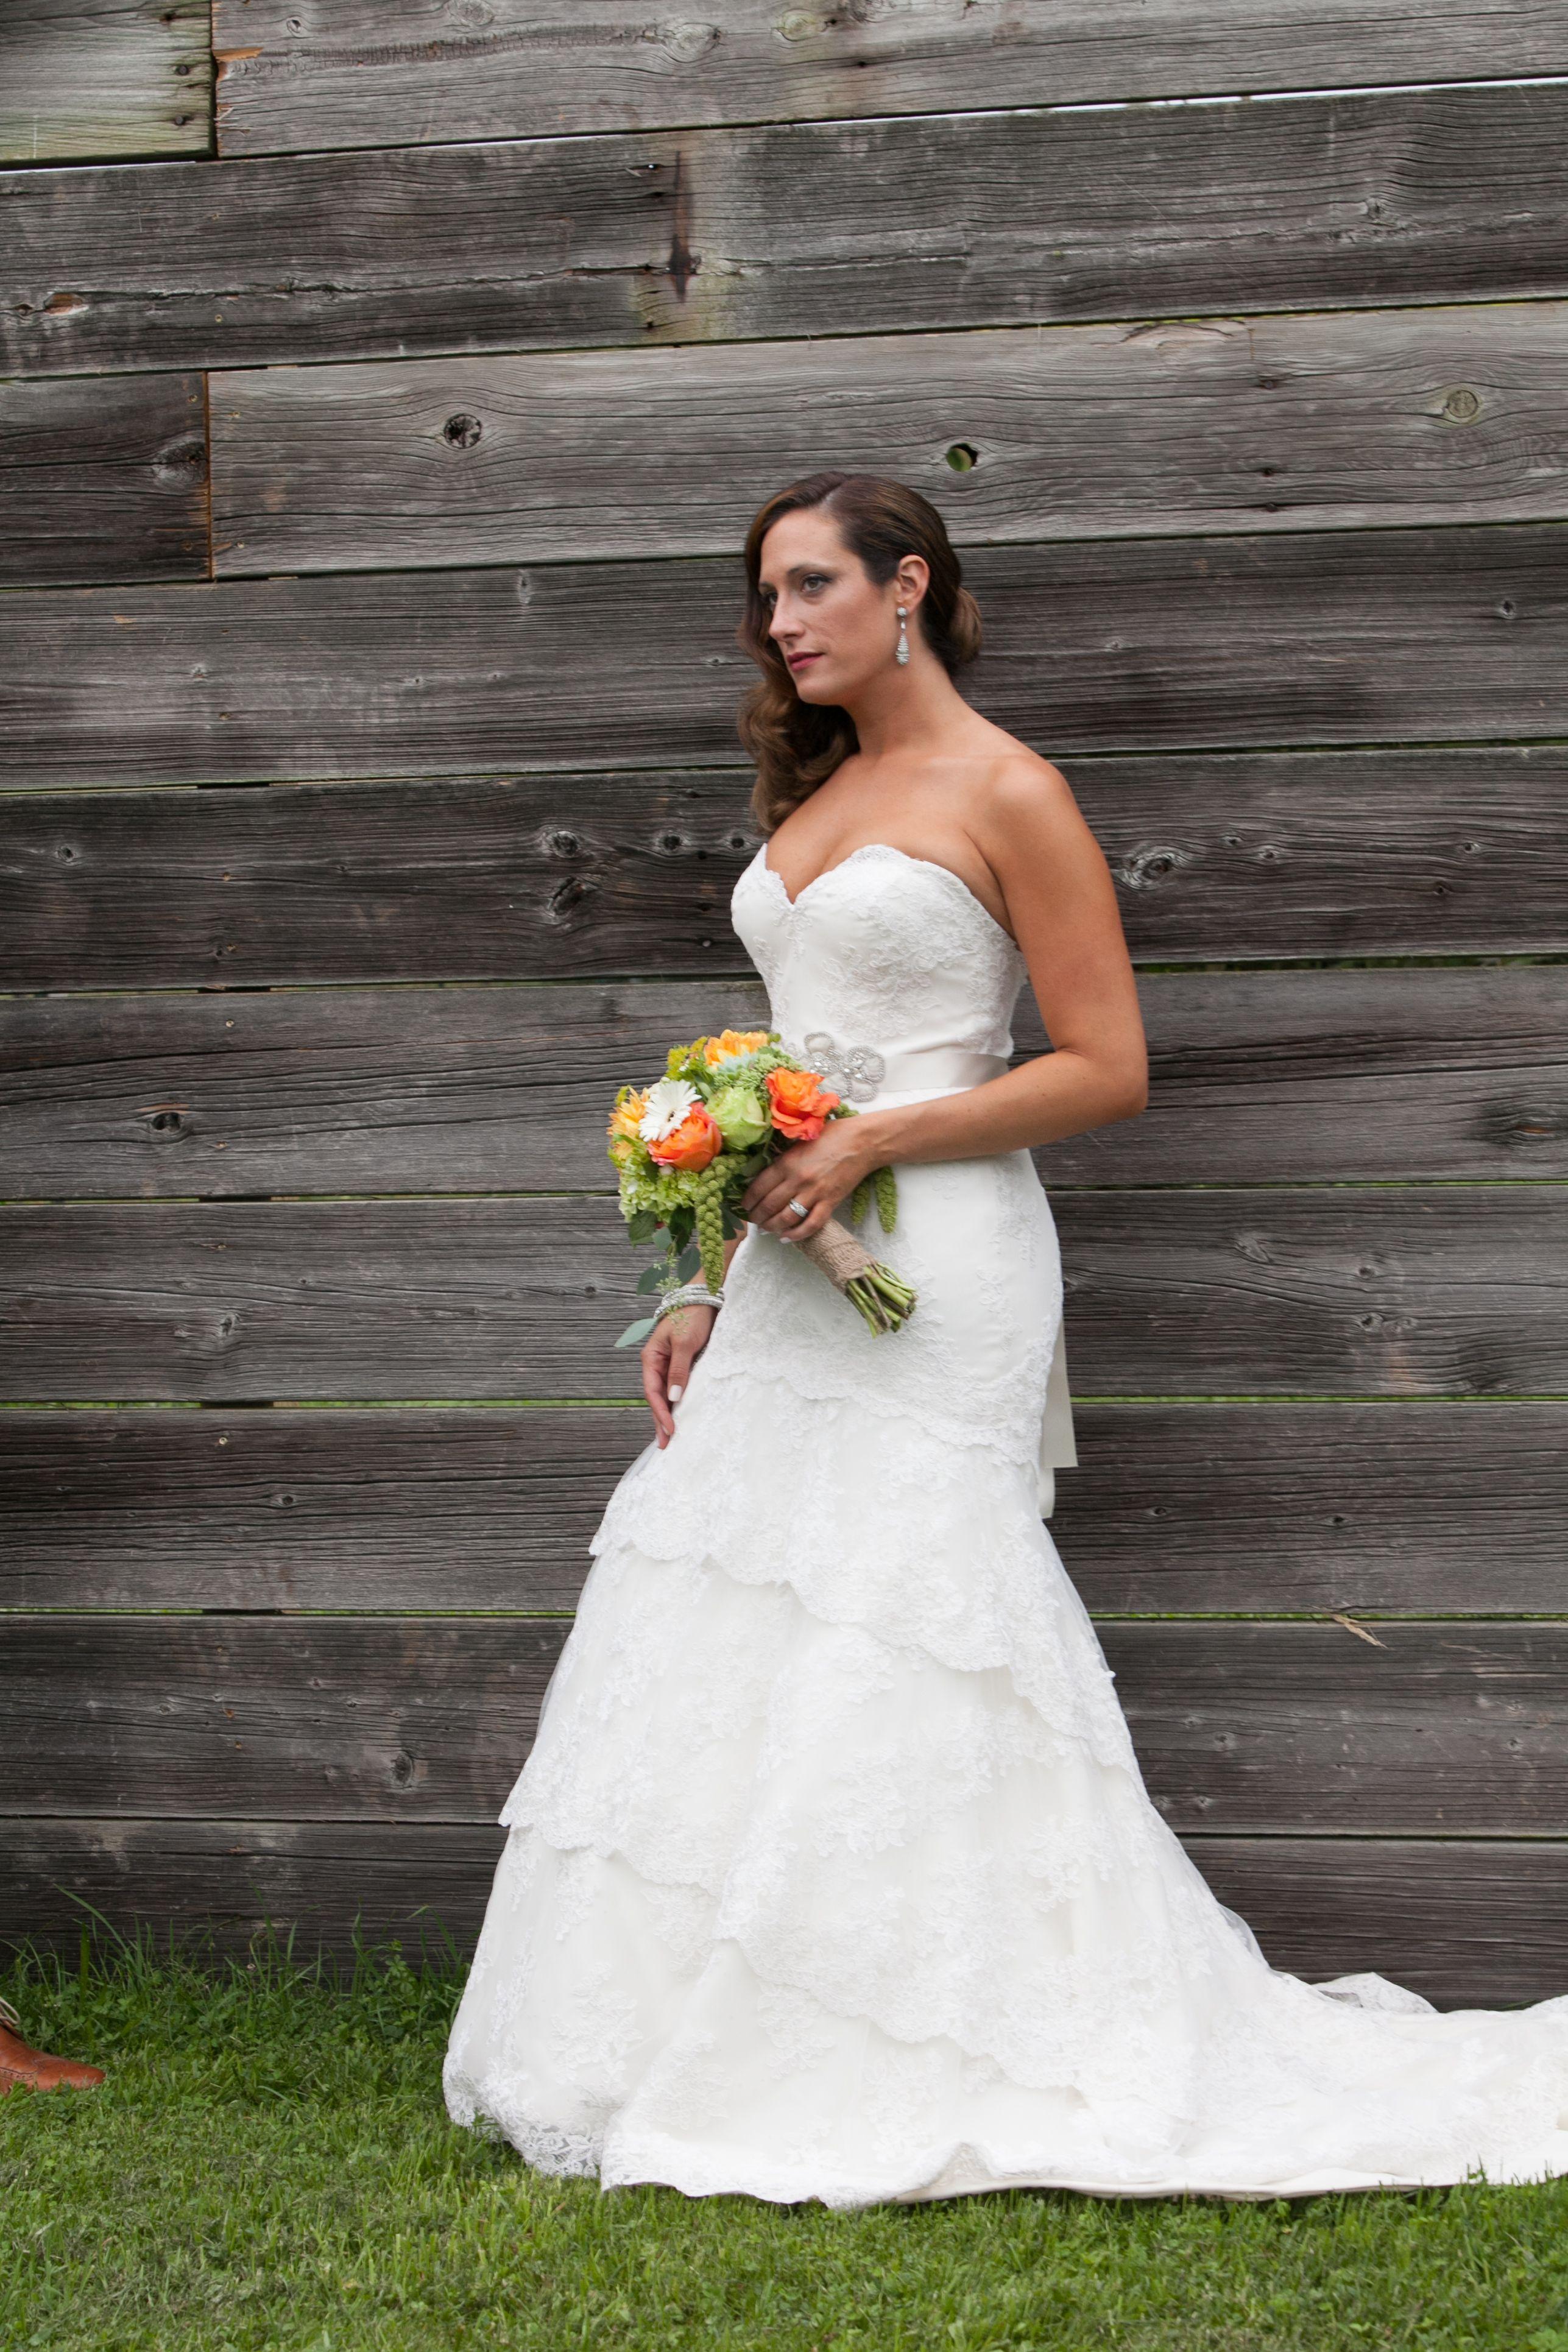 87b3c0740e91c wedding dress | wedding shoes | wedding accessories | portrait | yellow  flowers | rustic wedding